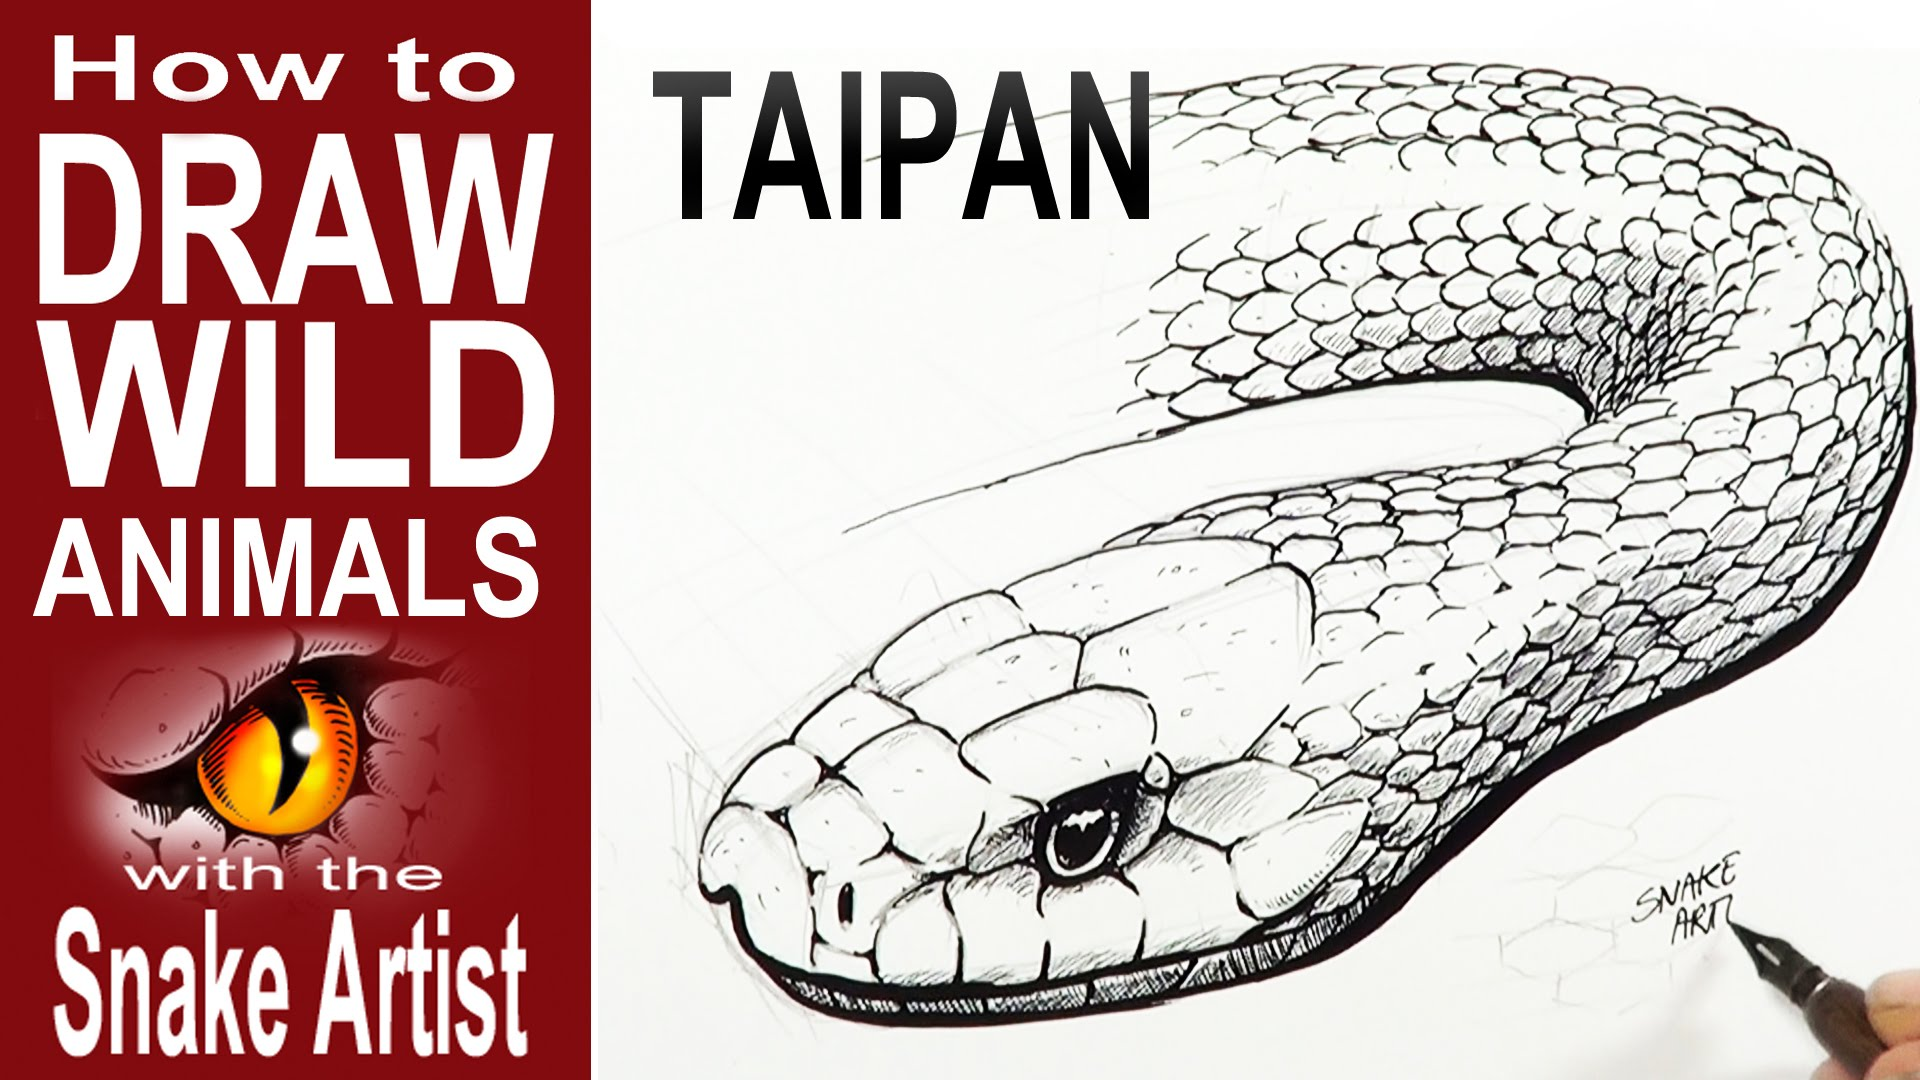 1920x1080 How To Draw A Taipan (Intermediate To Advanced)